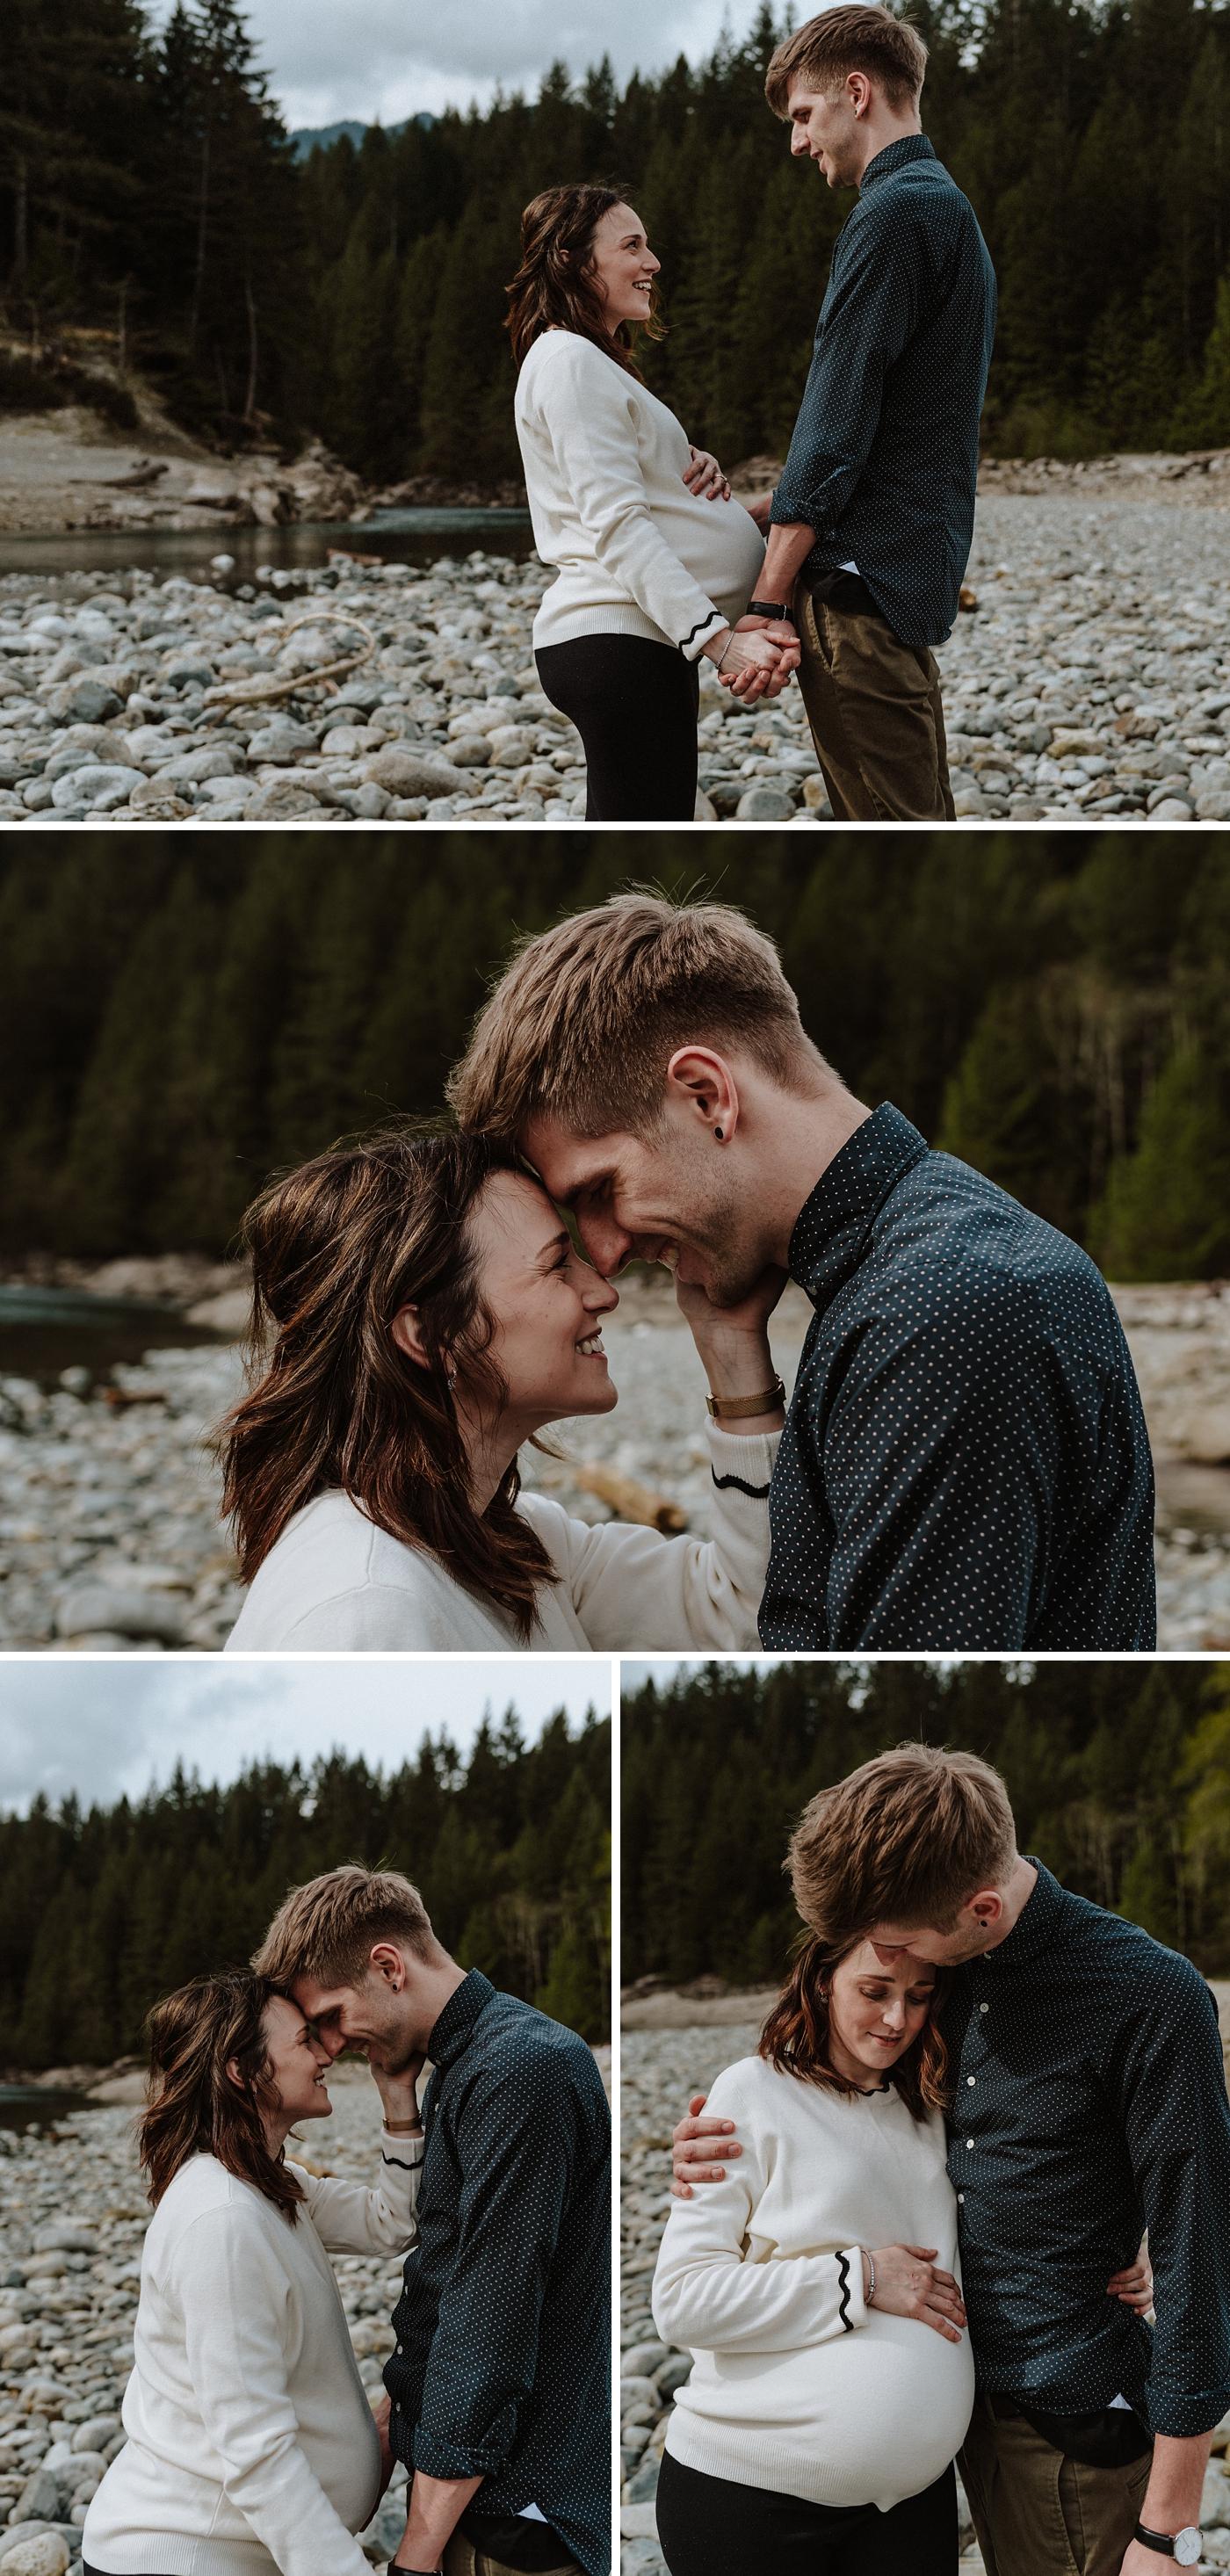 Maple-Ridge-Romantic-Wilderness-Maternity-Photography_0015.jpg